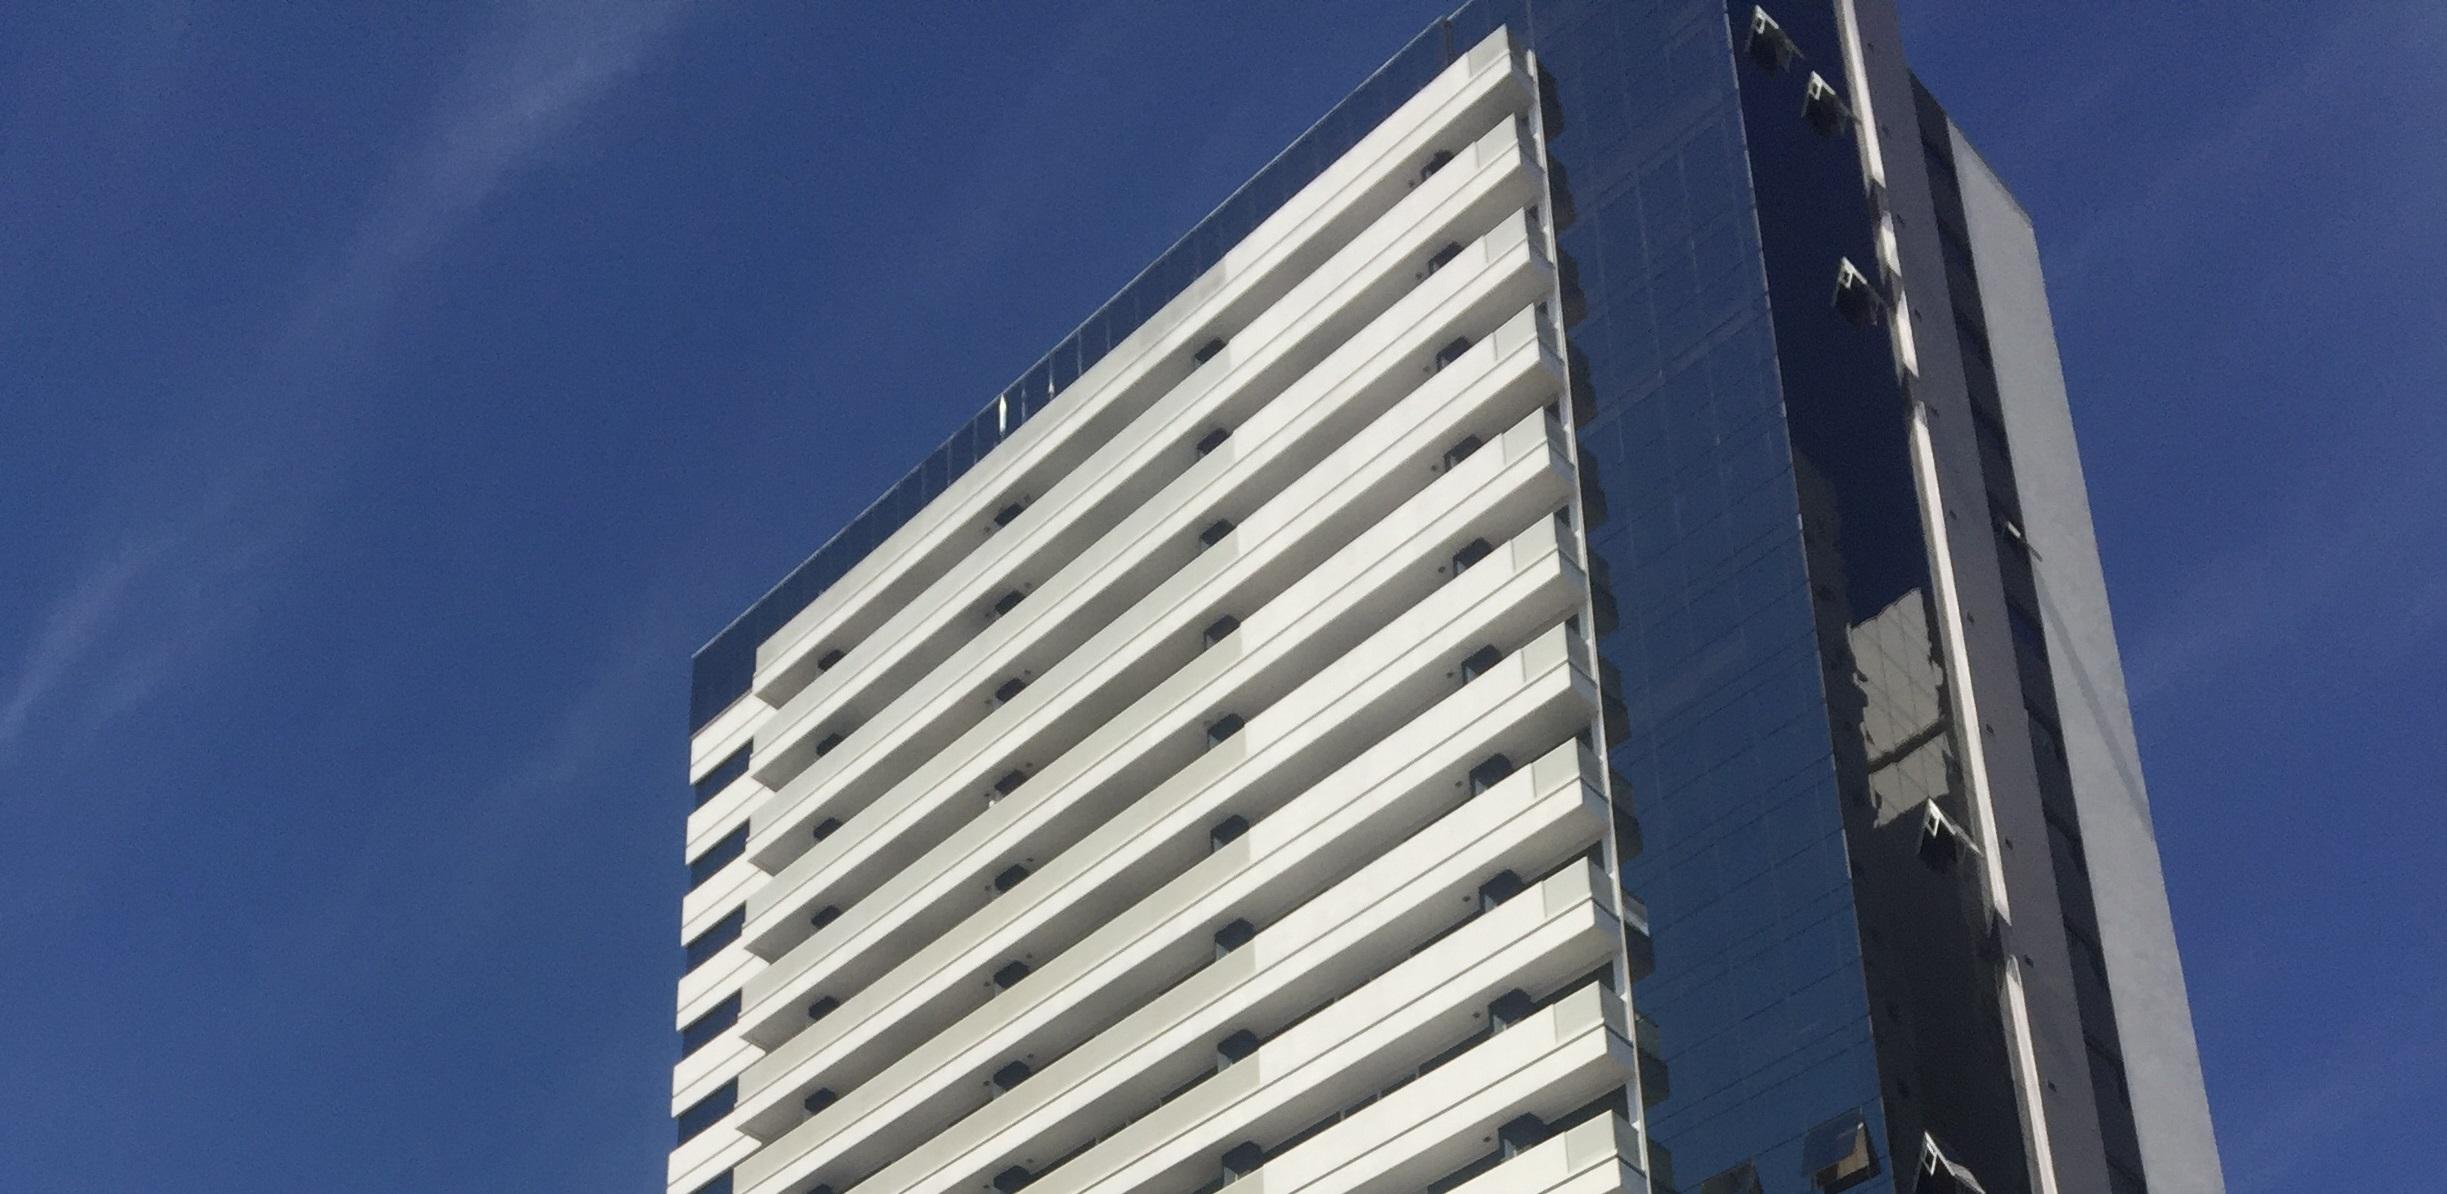 Andar Inteiro 536,36m² Edifício Office Life